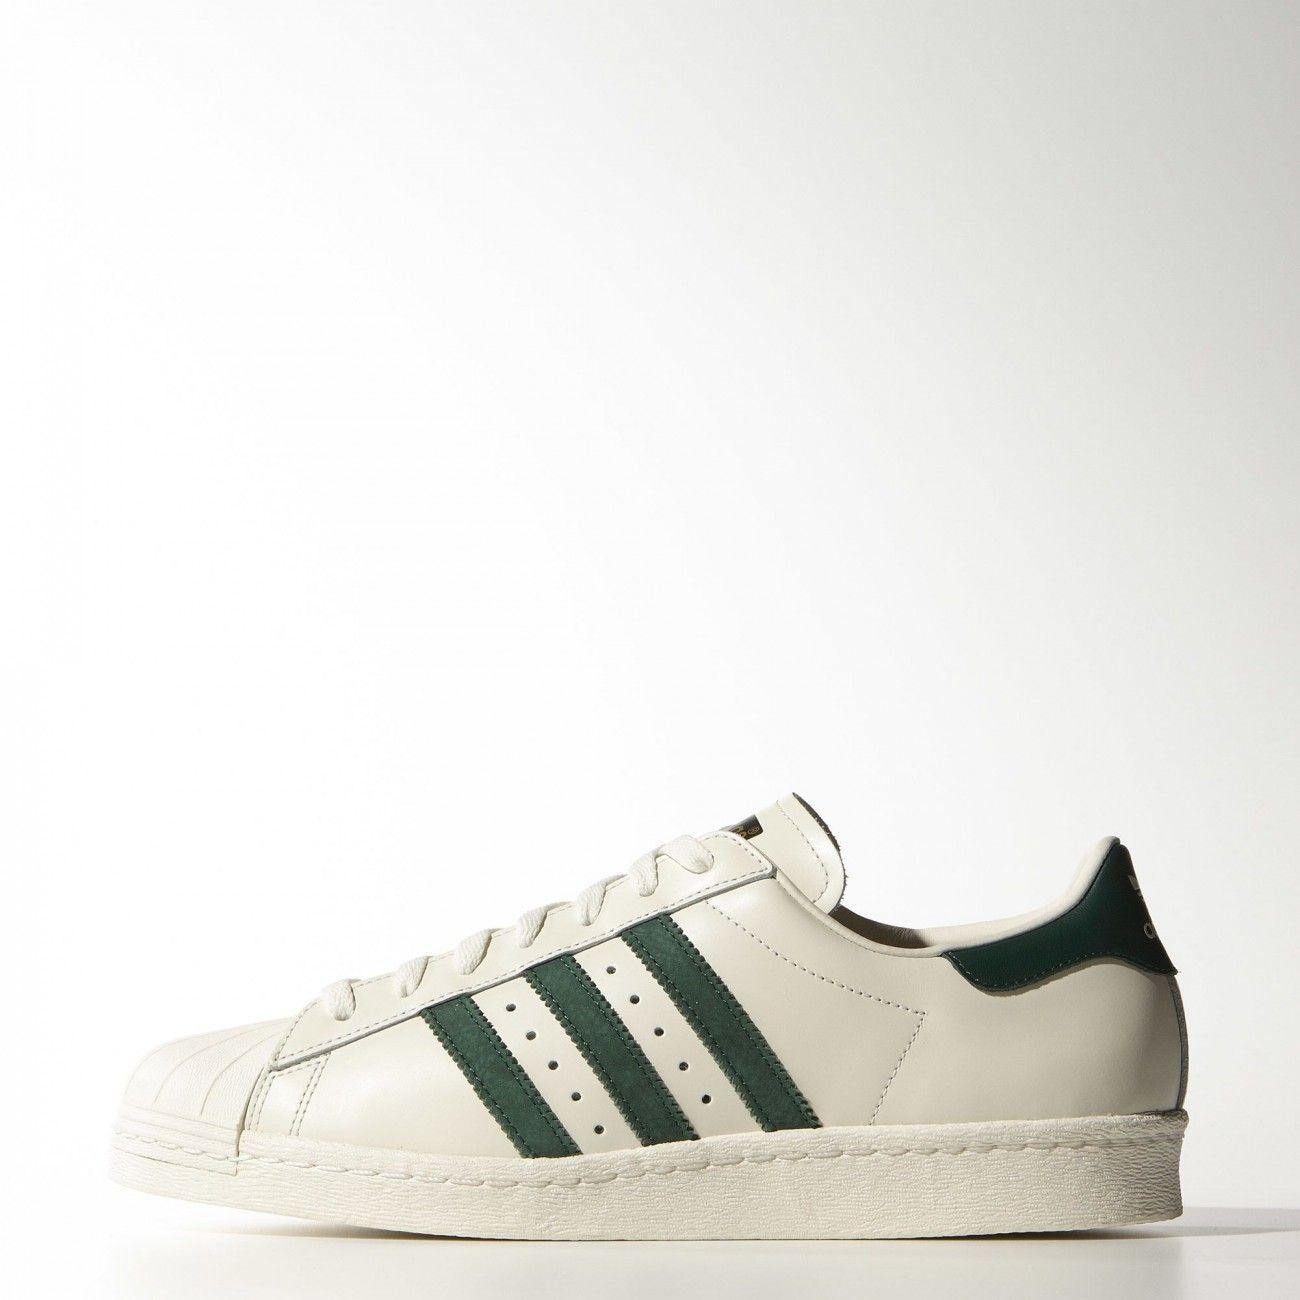 adidas Originals Footwear Superstar 80s Vintage Deluxe Trainers Vintage White Collegiate Green Off White